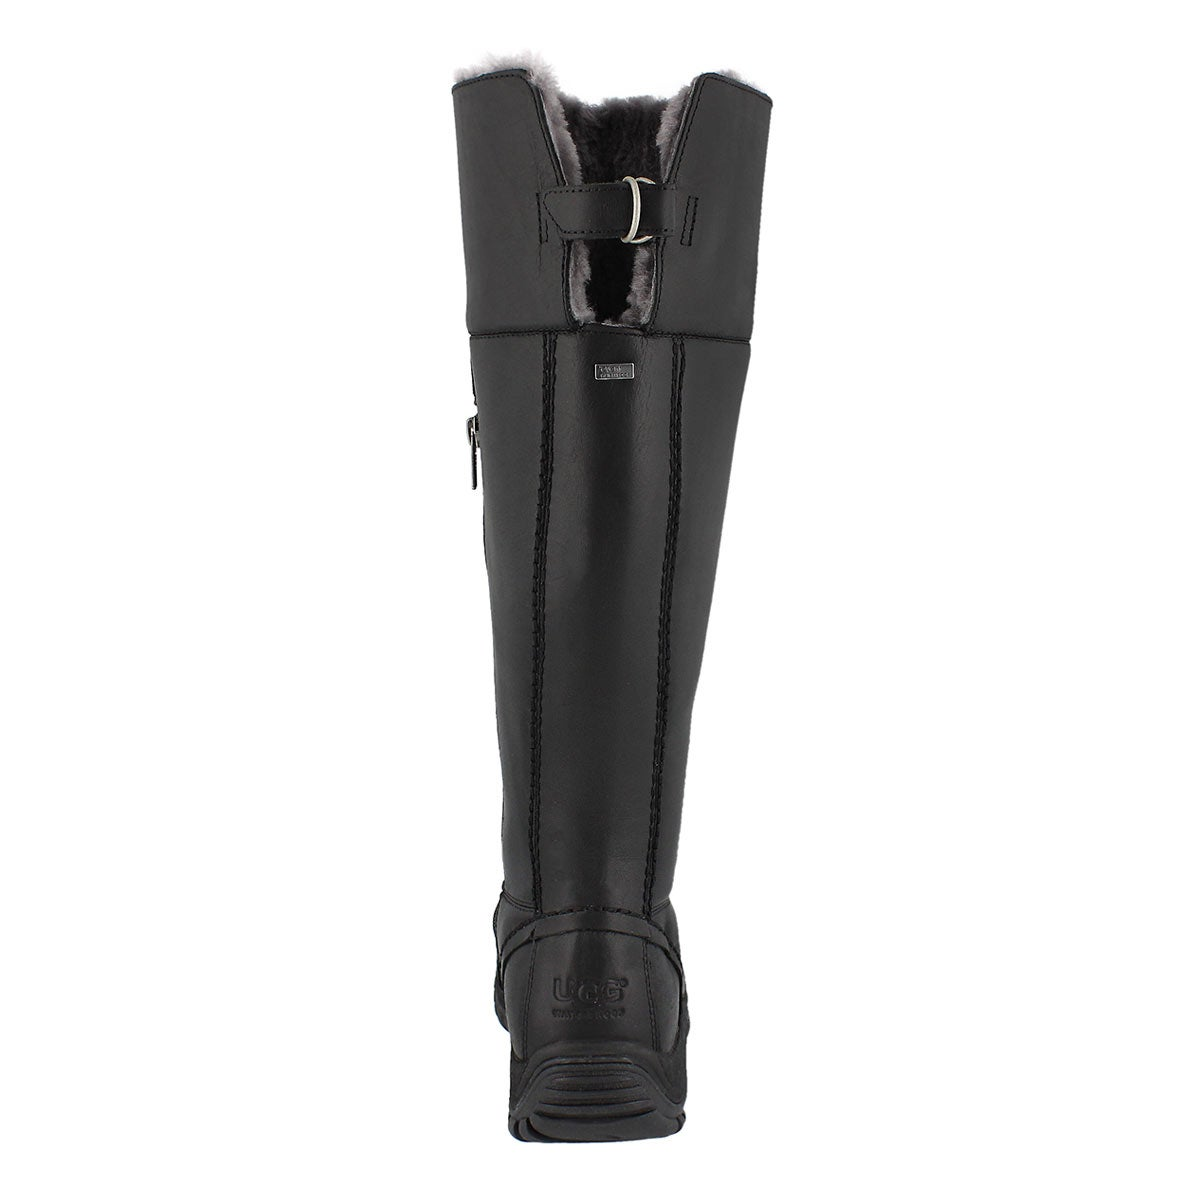 Lds Miko black winter boot